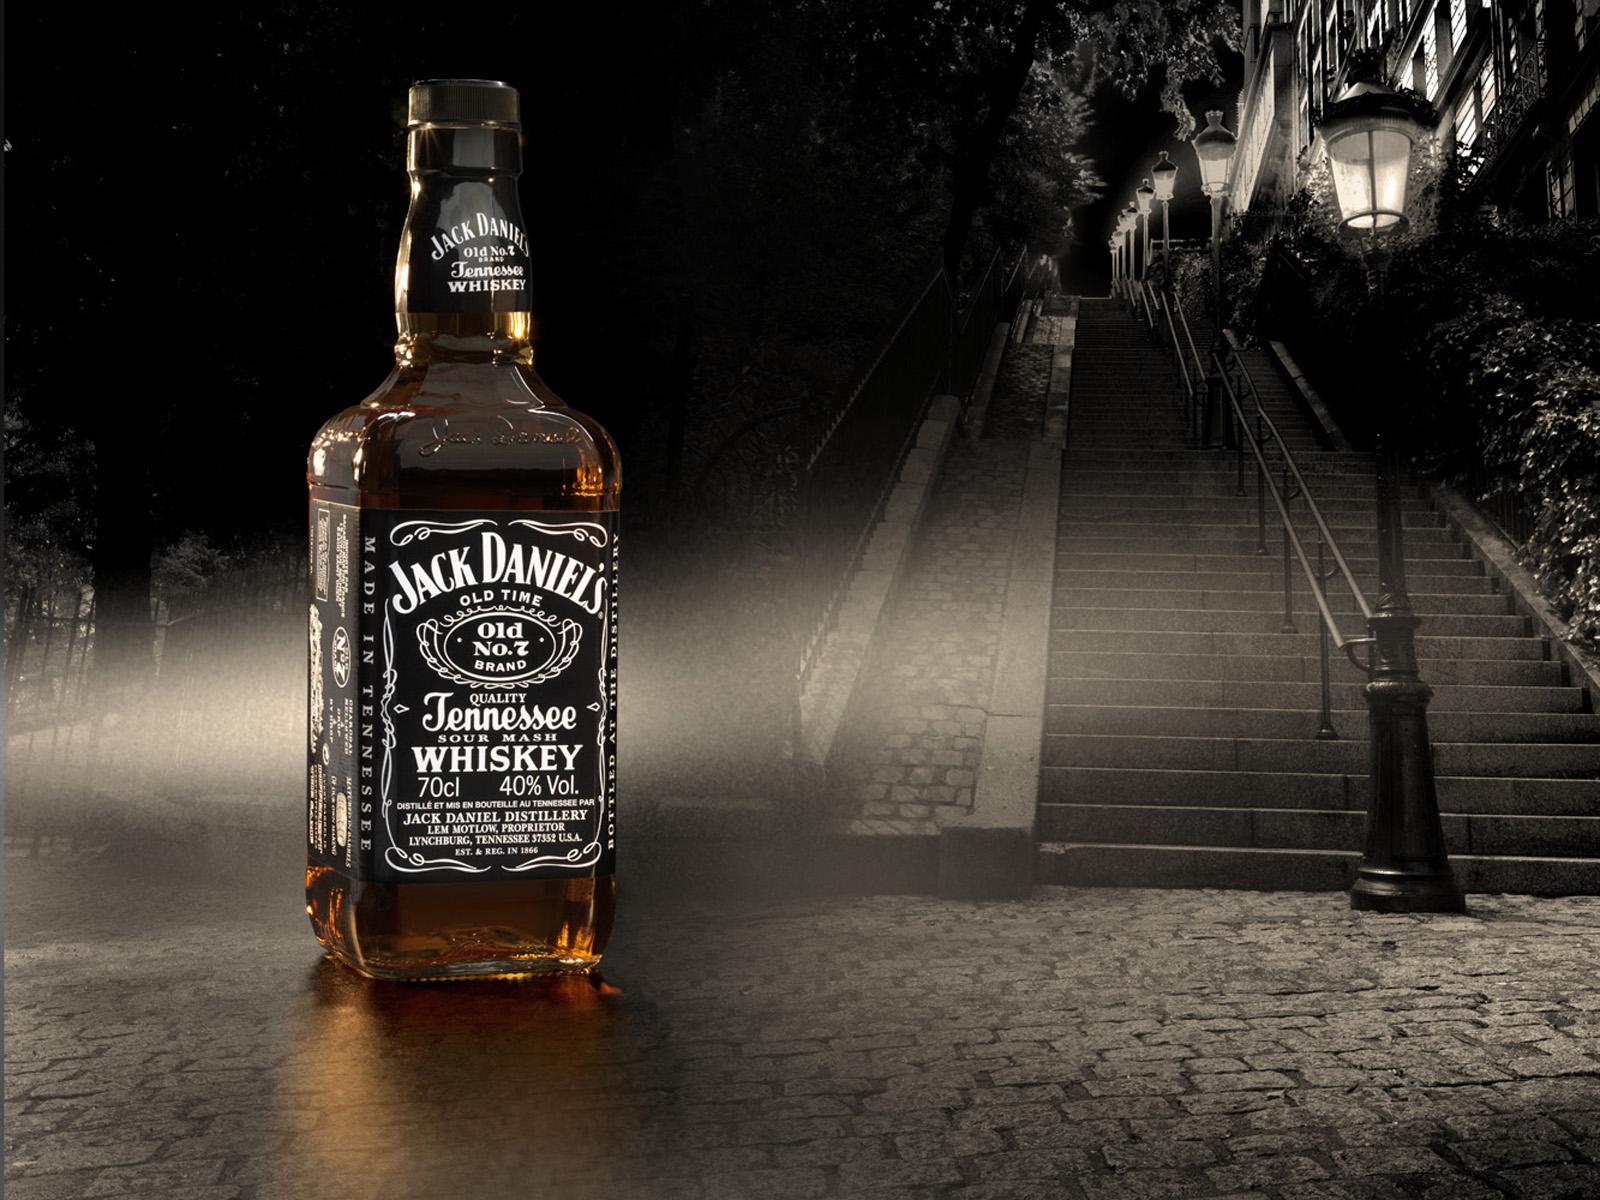 [43+] Whiskey Wallpapers HD On WallpaperSafari